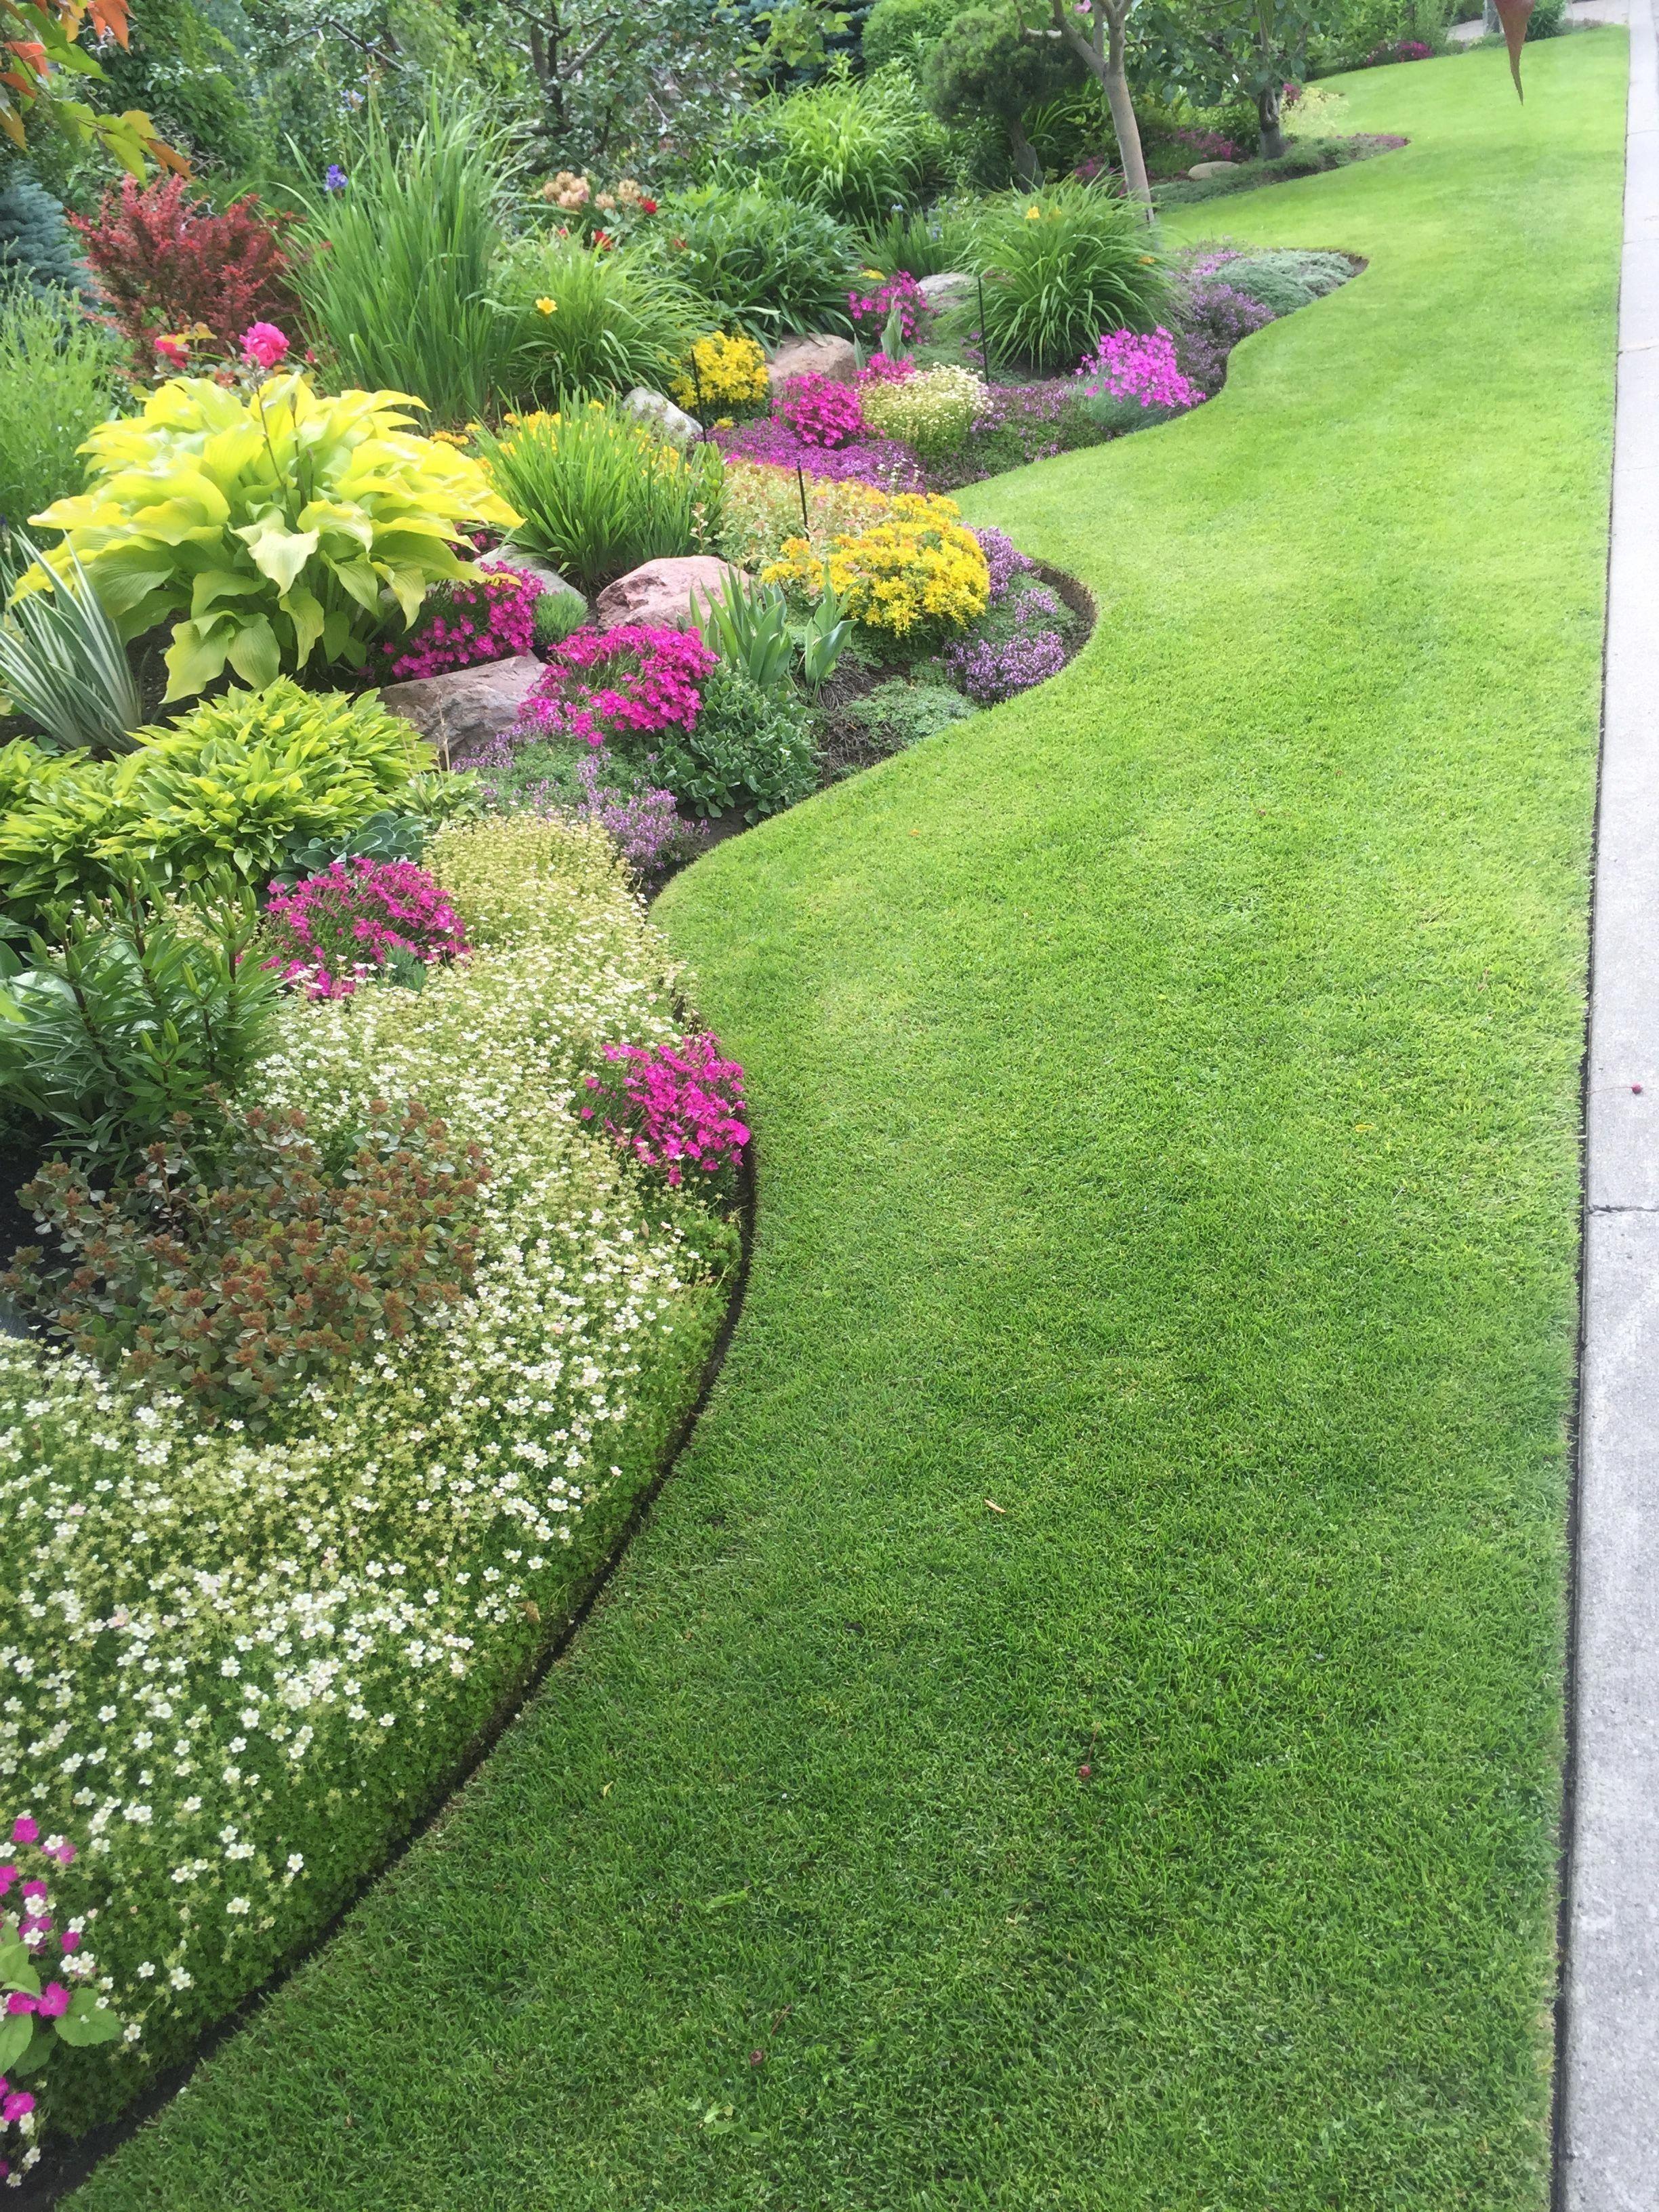 Paisajismo Basico Del Patio Delantero Sandy 1000 In 2020 Garden Design Layout Landscaping Garden Design Small Yard Landscaping